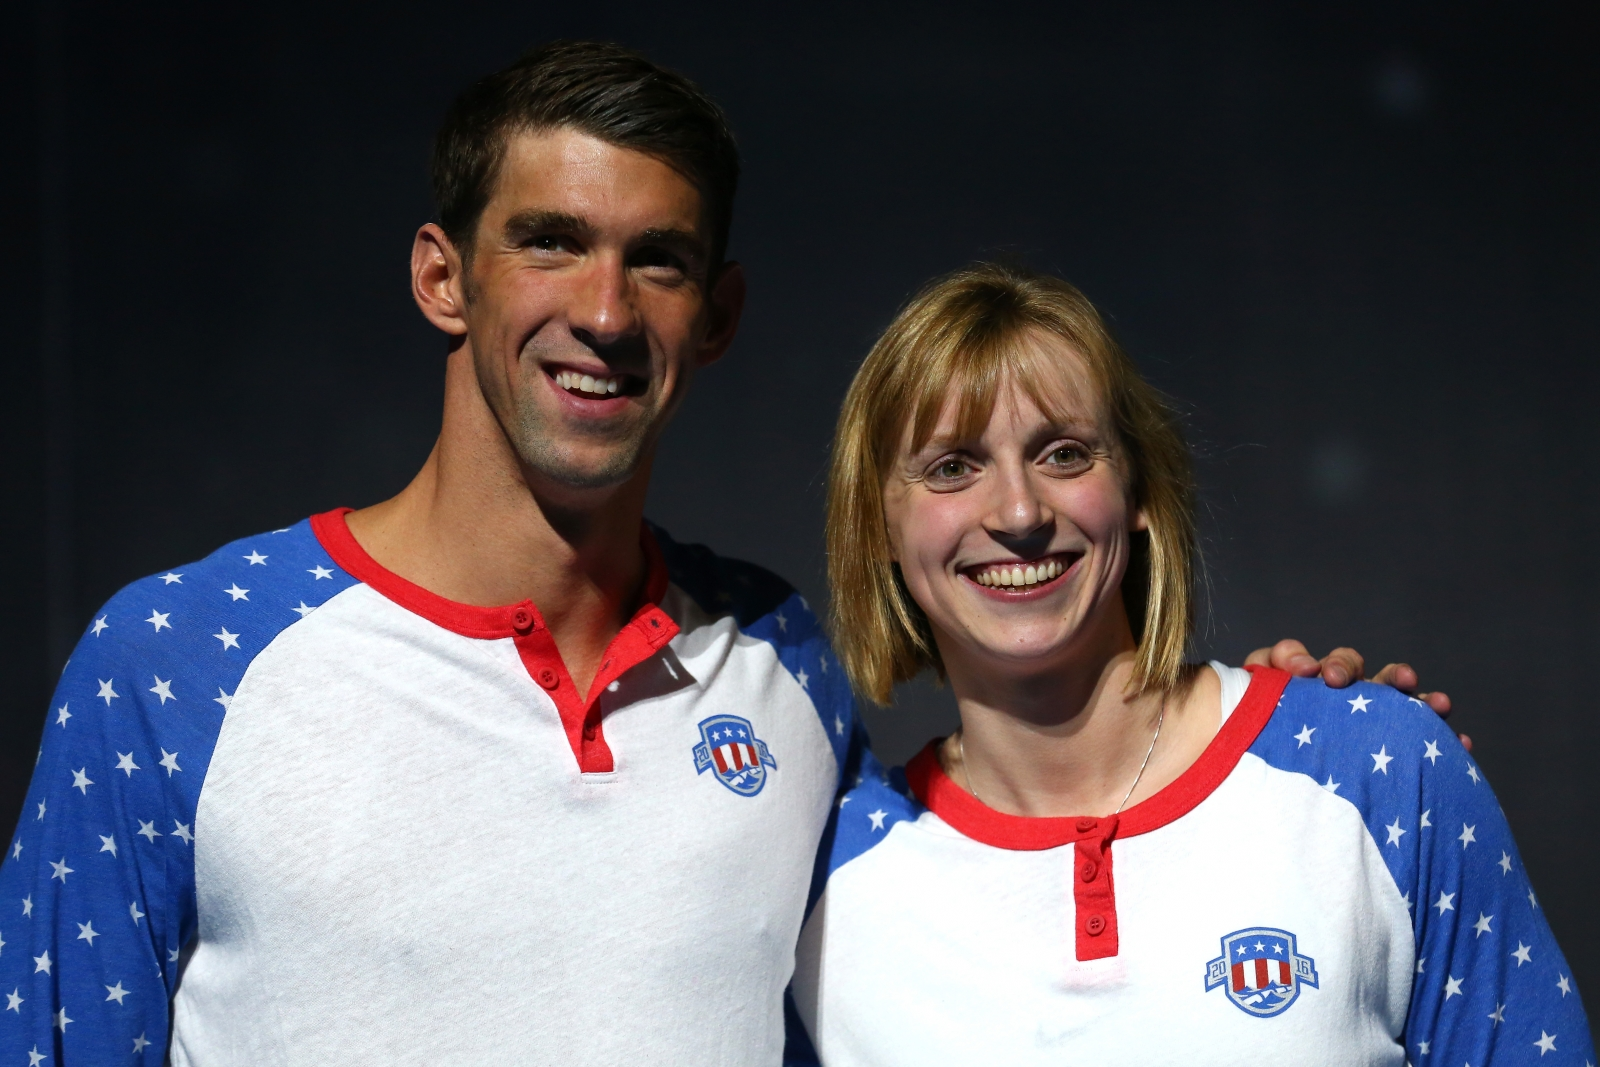 Michael Phelps and Katie Ledecky